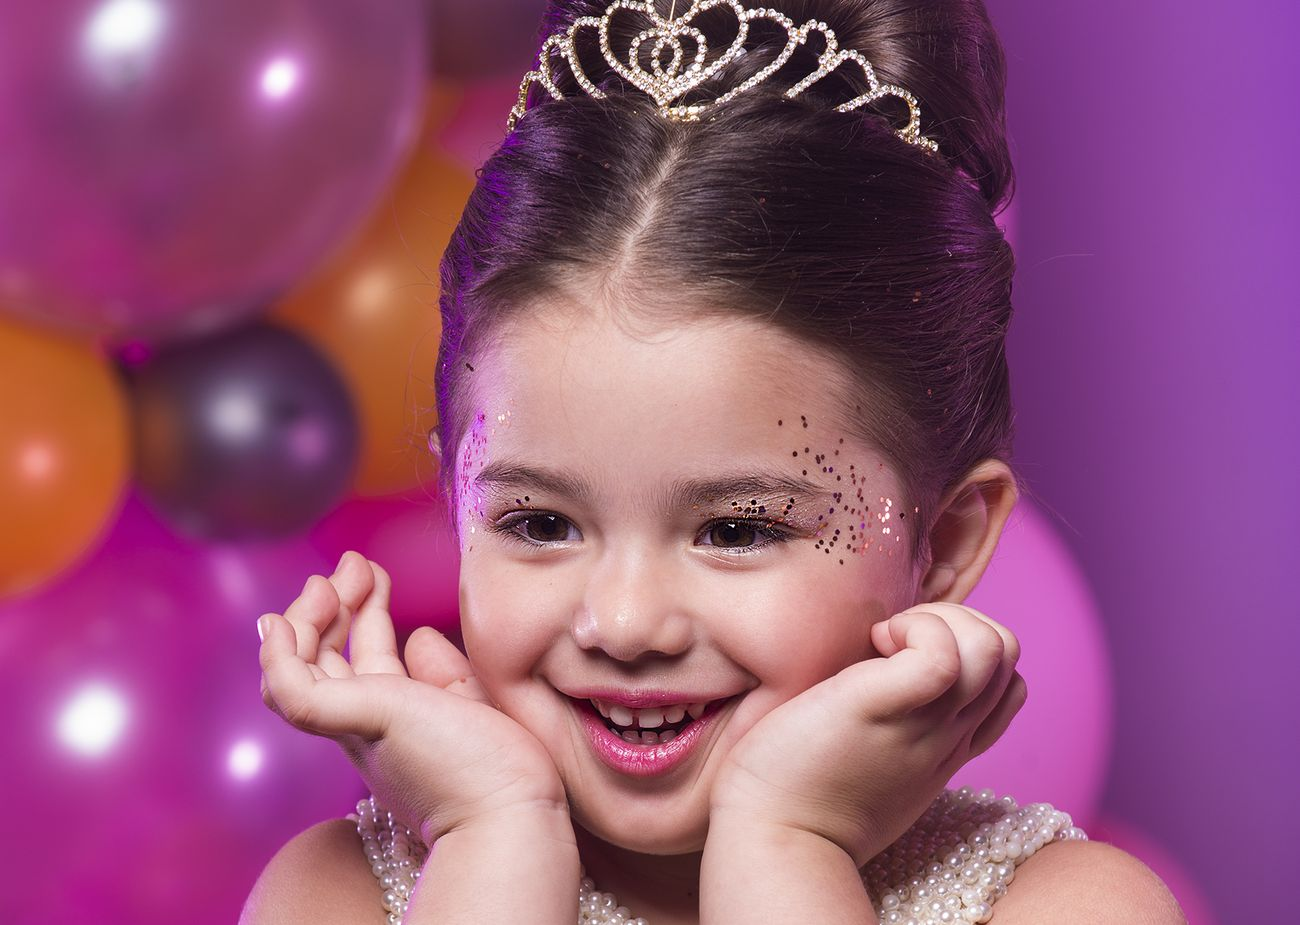 Sophia Eldo, Miss Universo Baby é destaque internacional